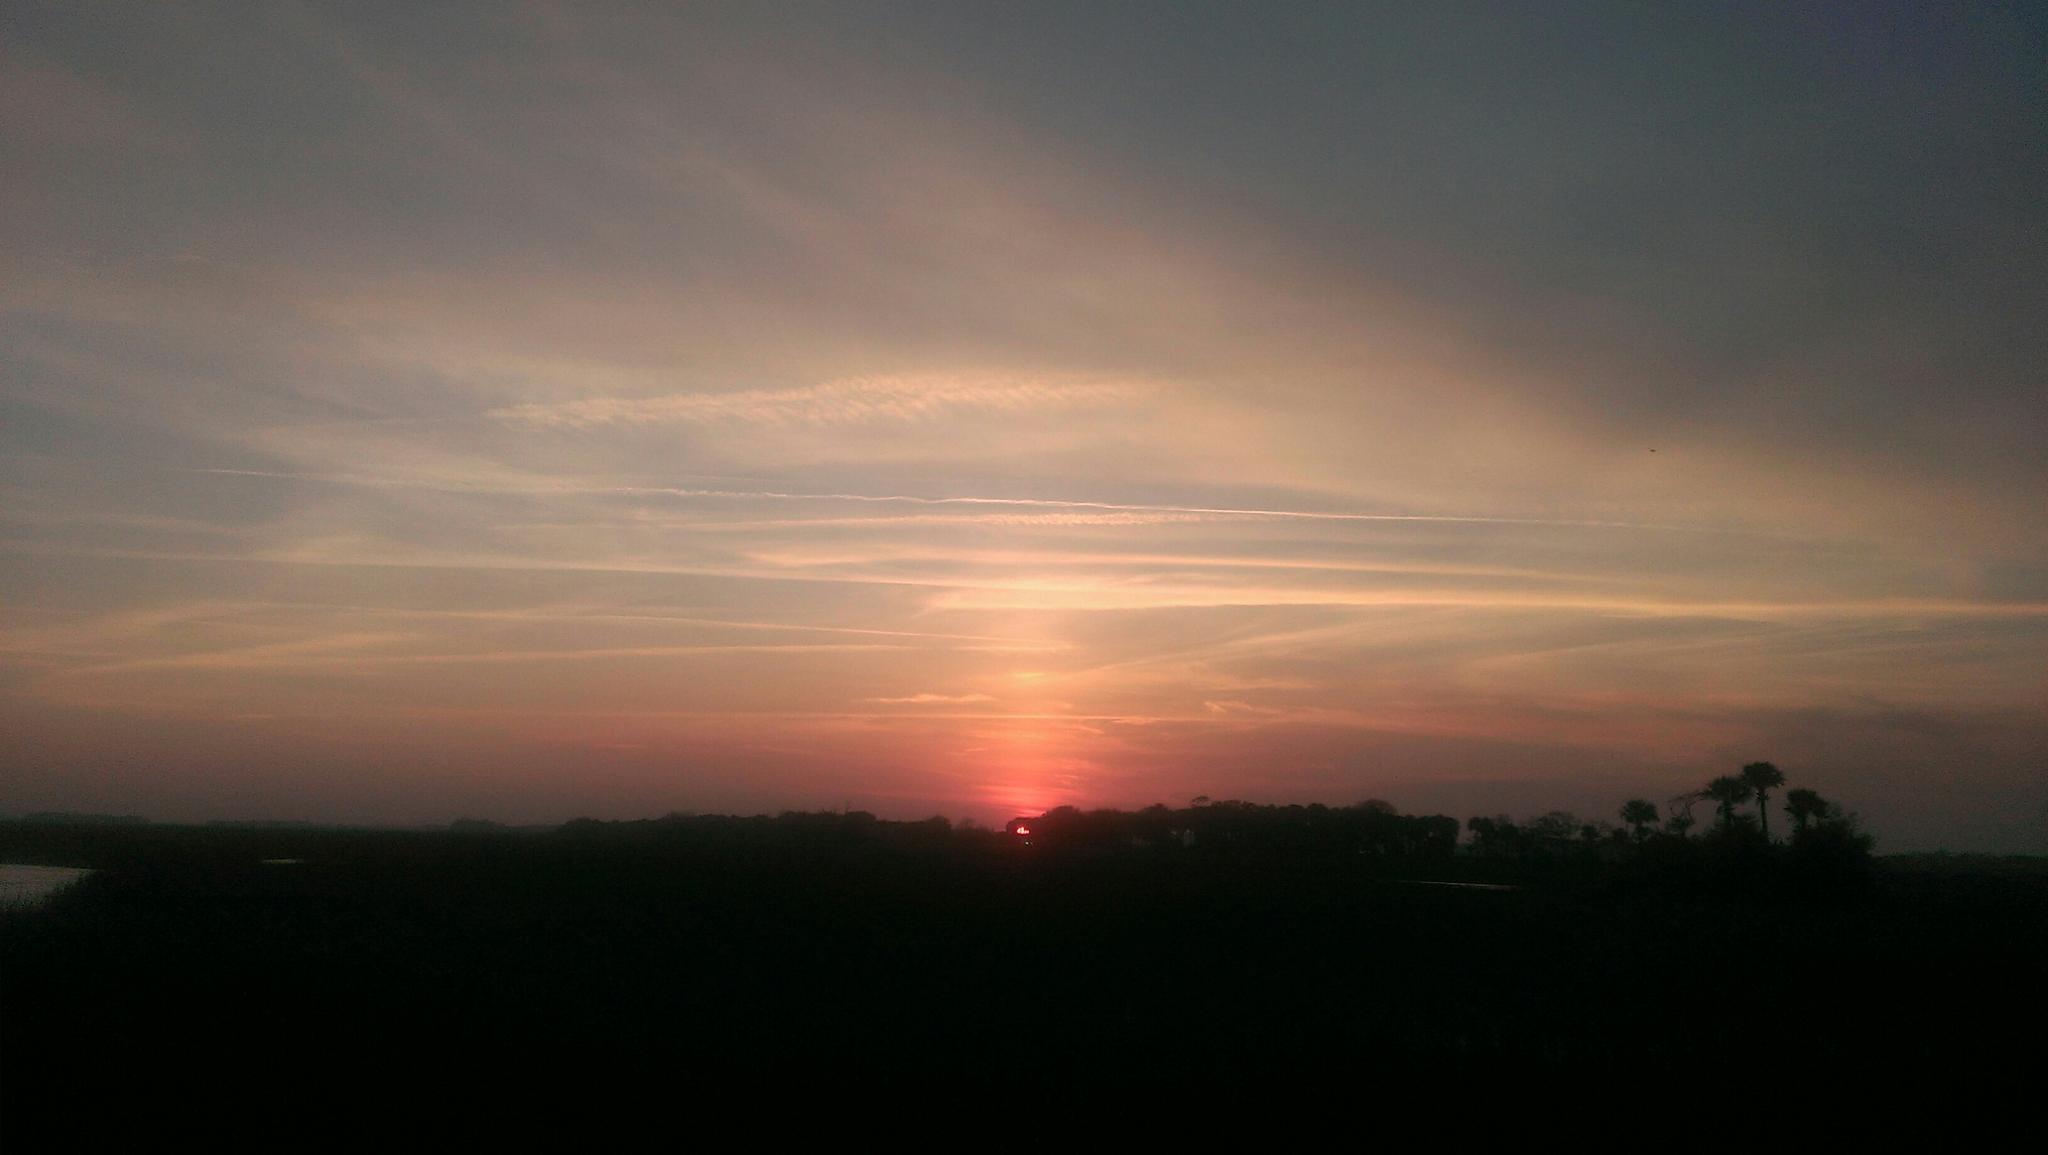 South Carolina Sunset by mayramar61